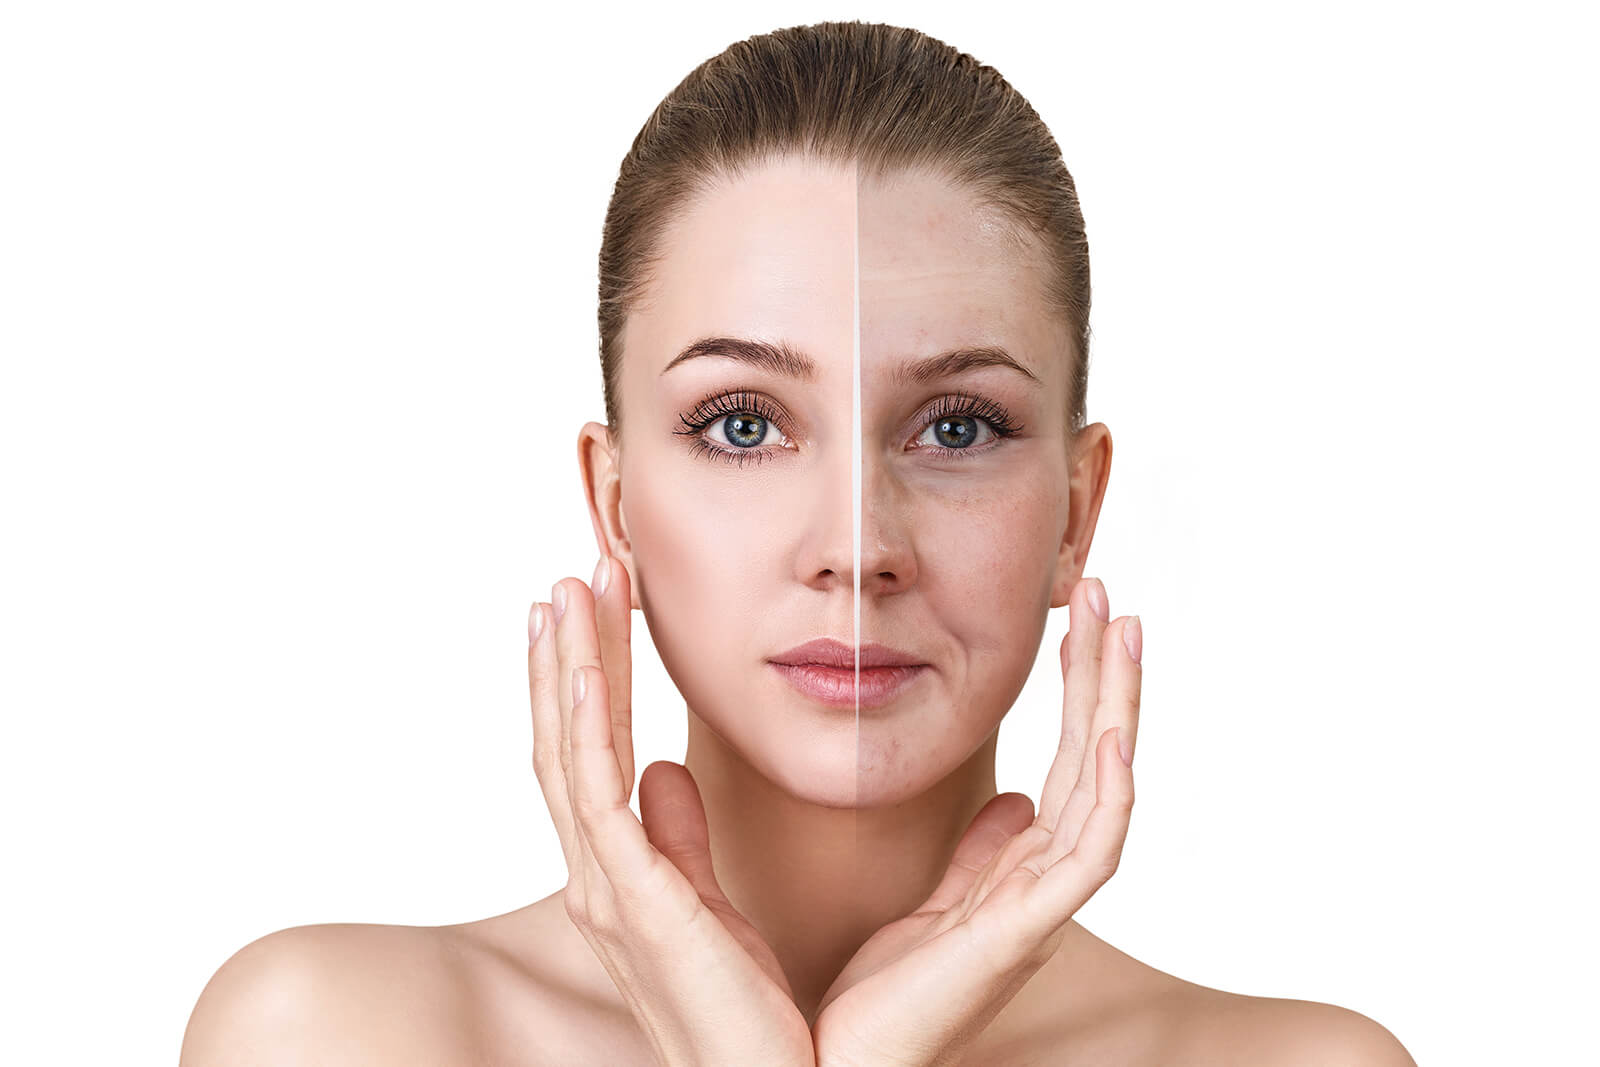 visage - restructuration visage ou profiloplastie 1